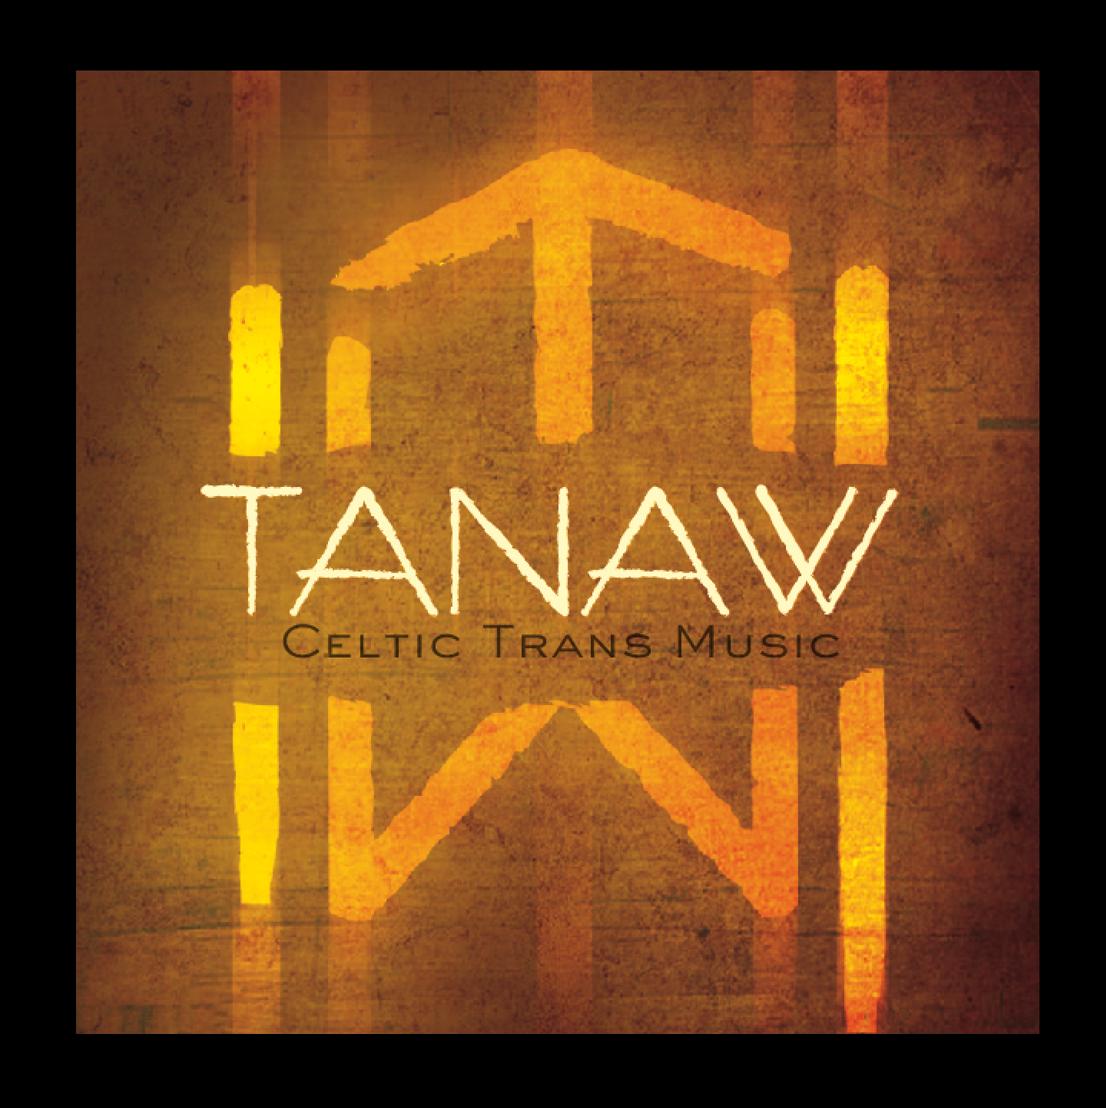 Tanaw